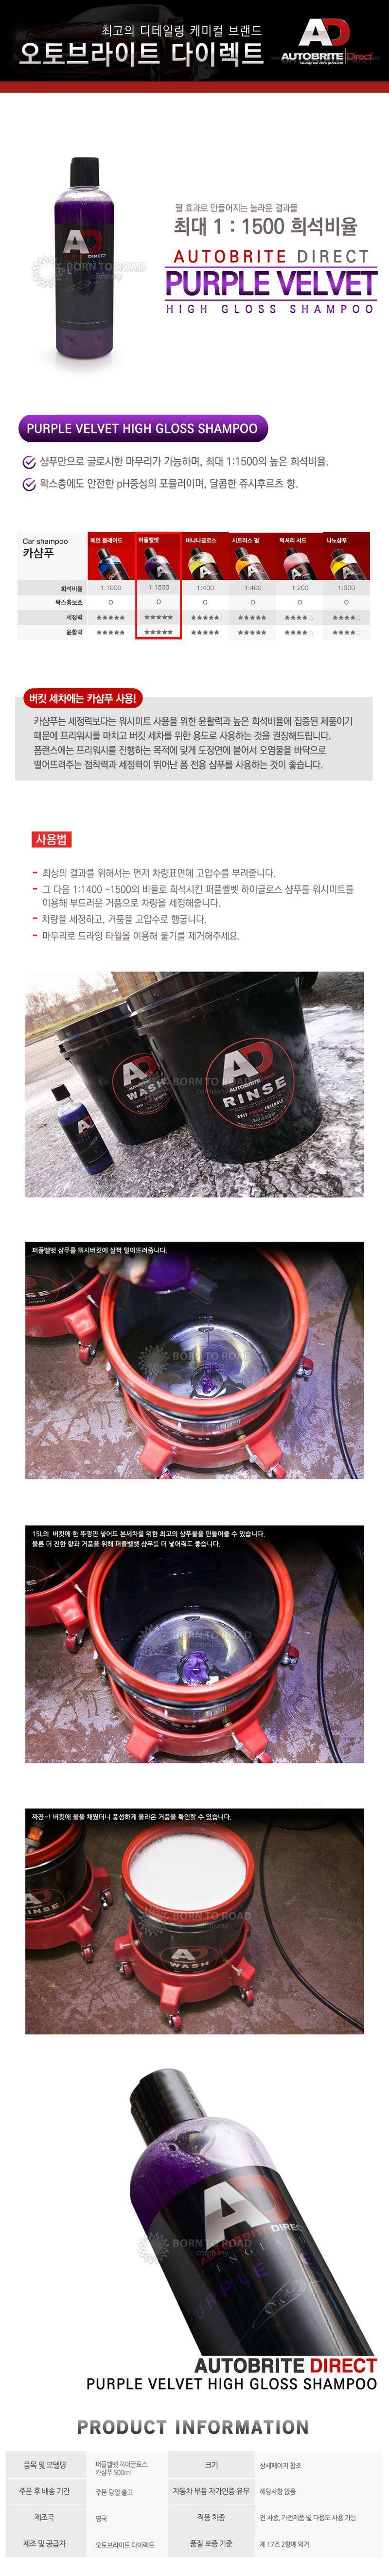 purplevelvet_btr.jpg